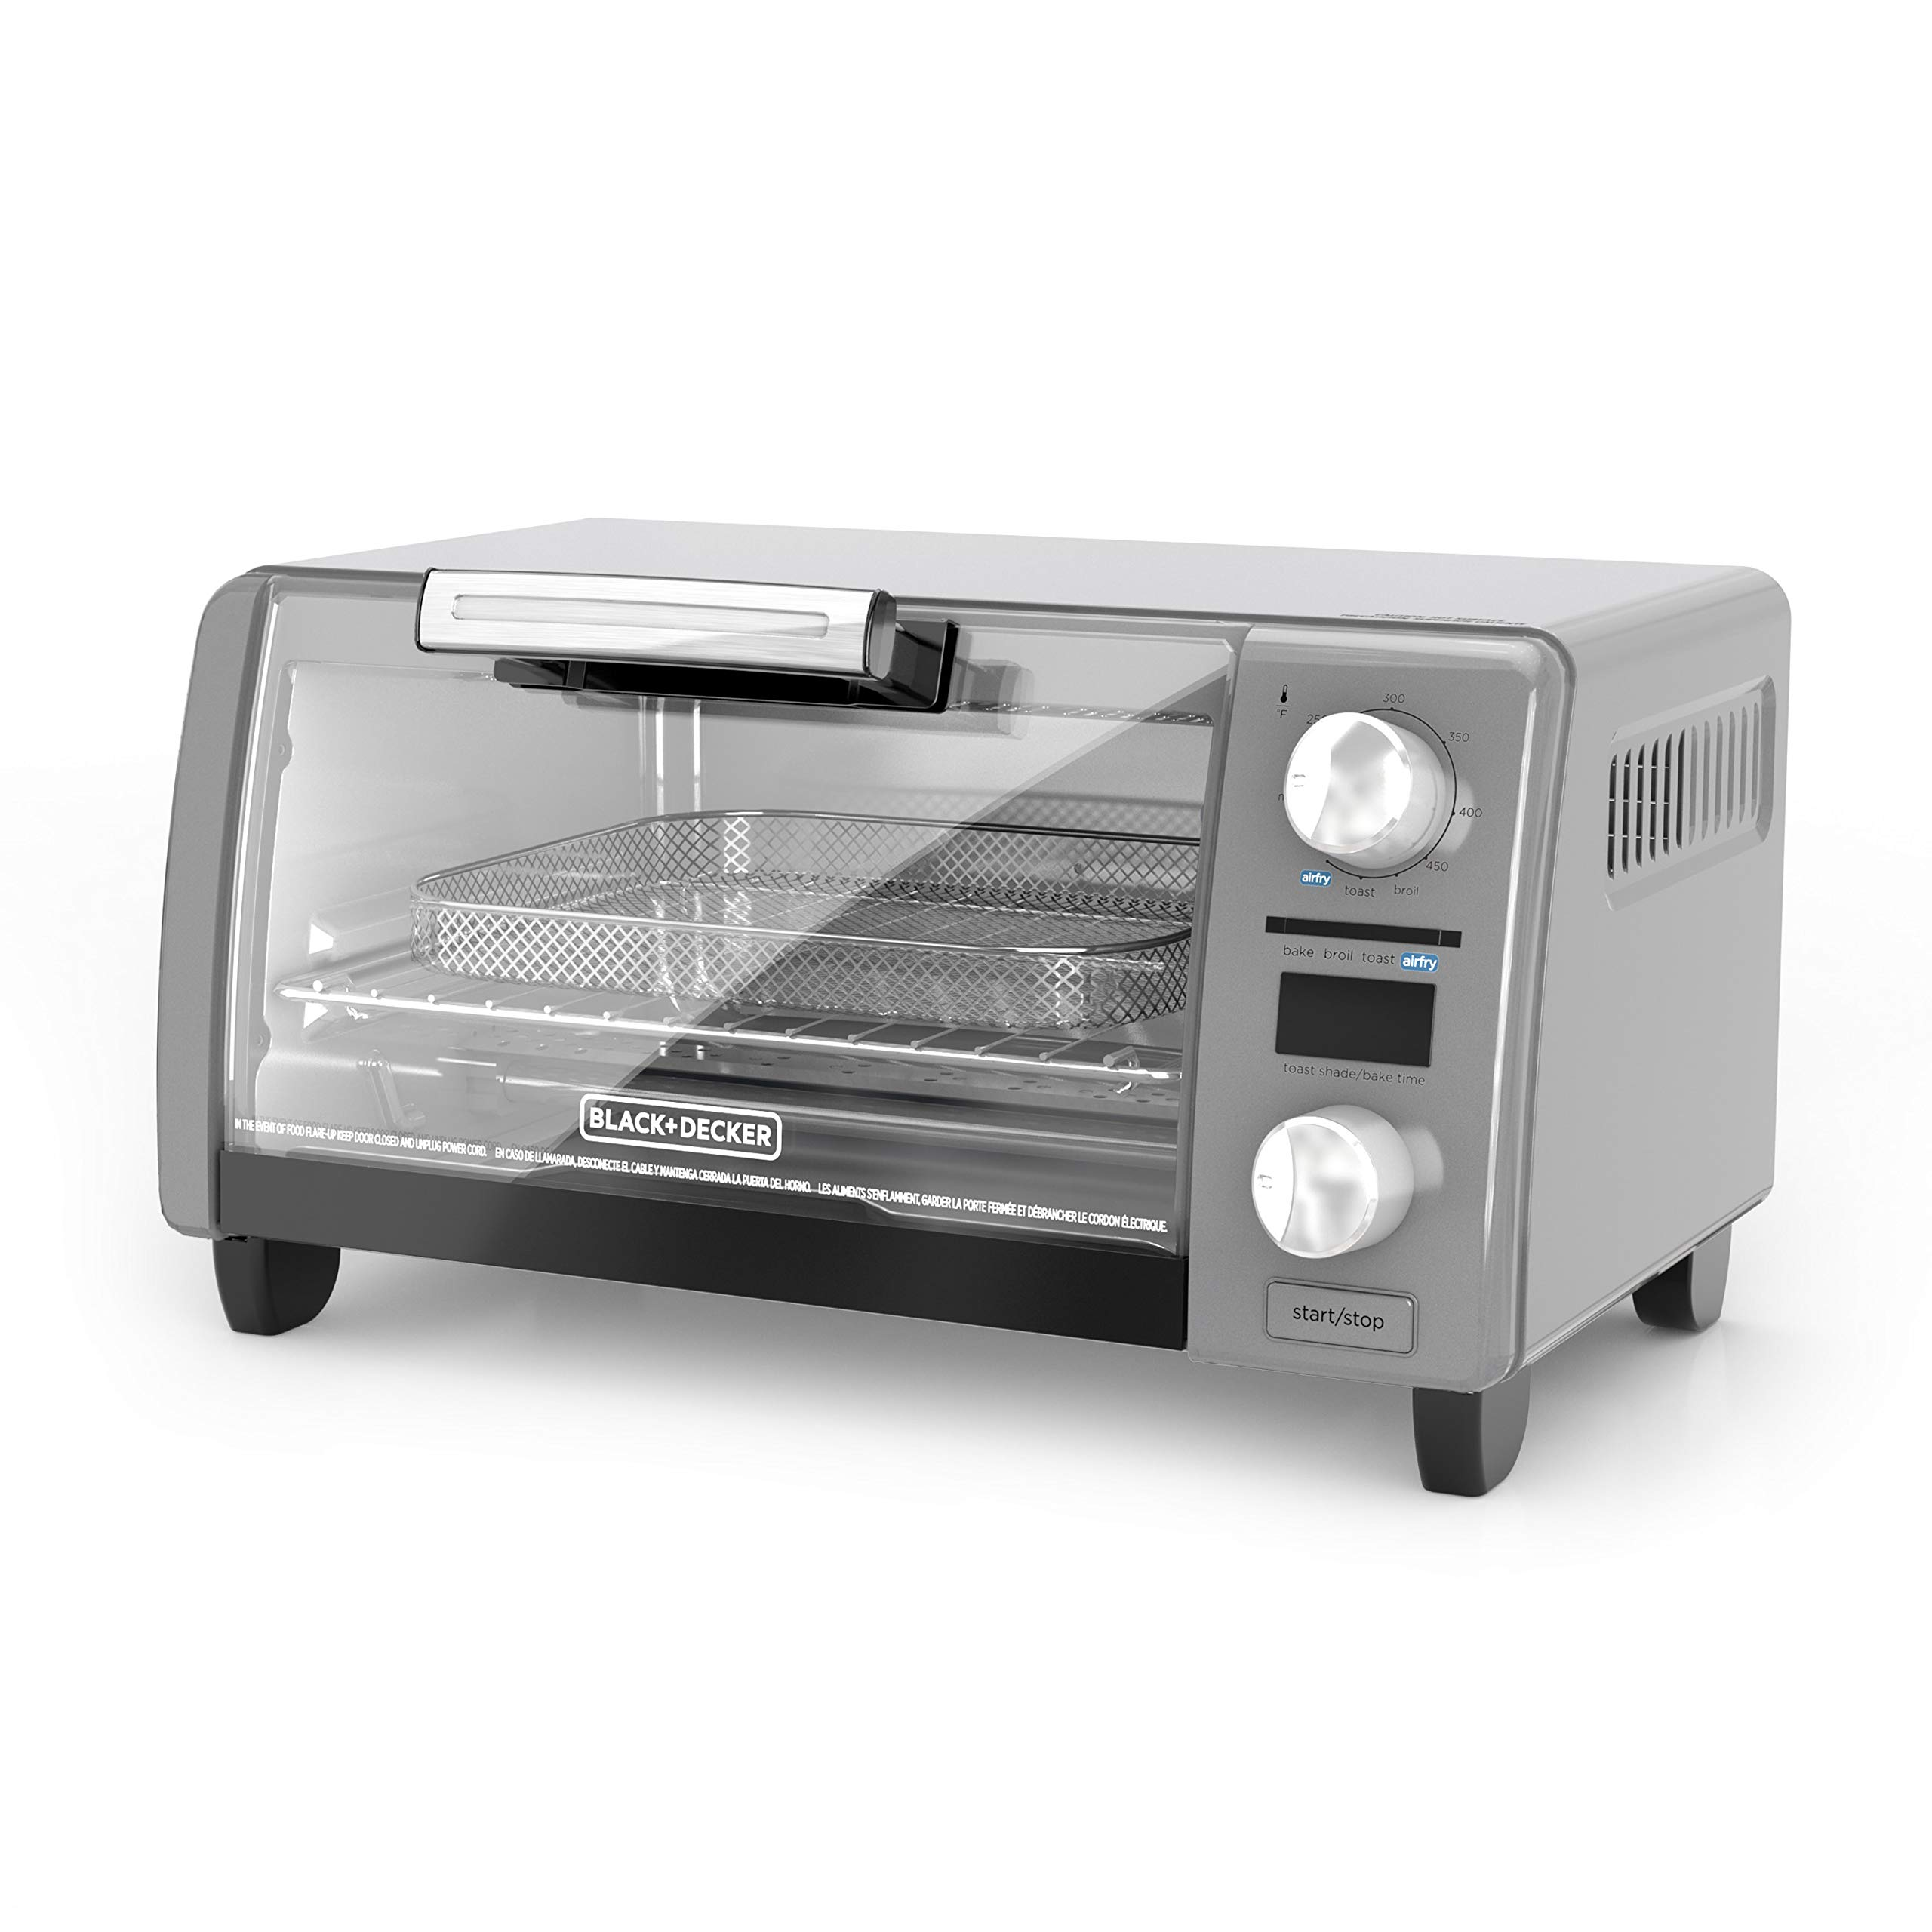 "BLACK+DECKER TOD1775G Crisp 'N Bake Air Fry Digital Toaster Oven, 9"" Pizza or 4 Slices of Bread, Gray"